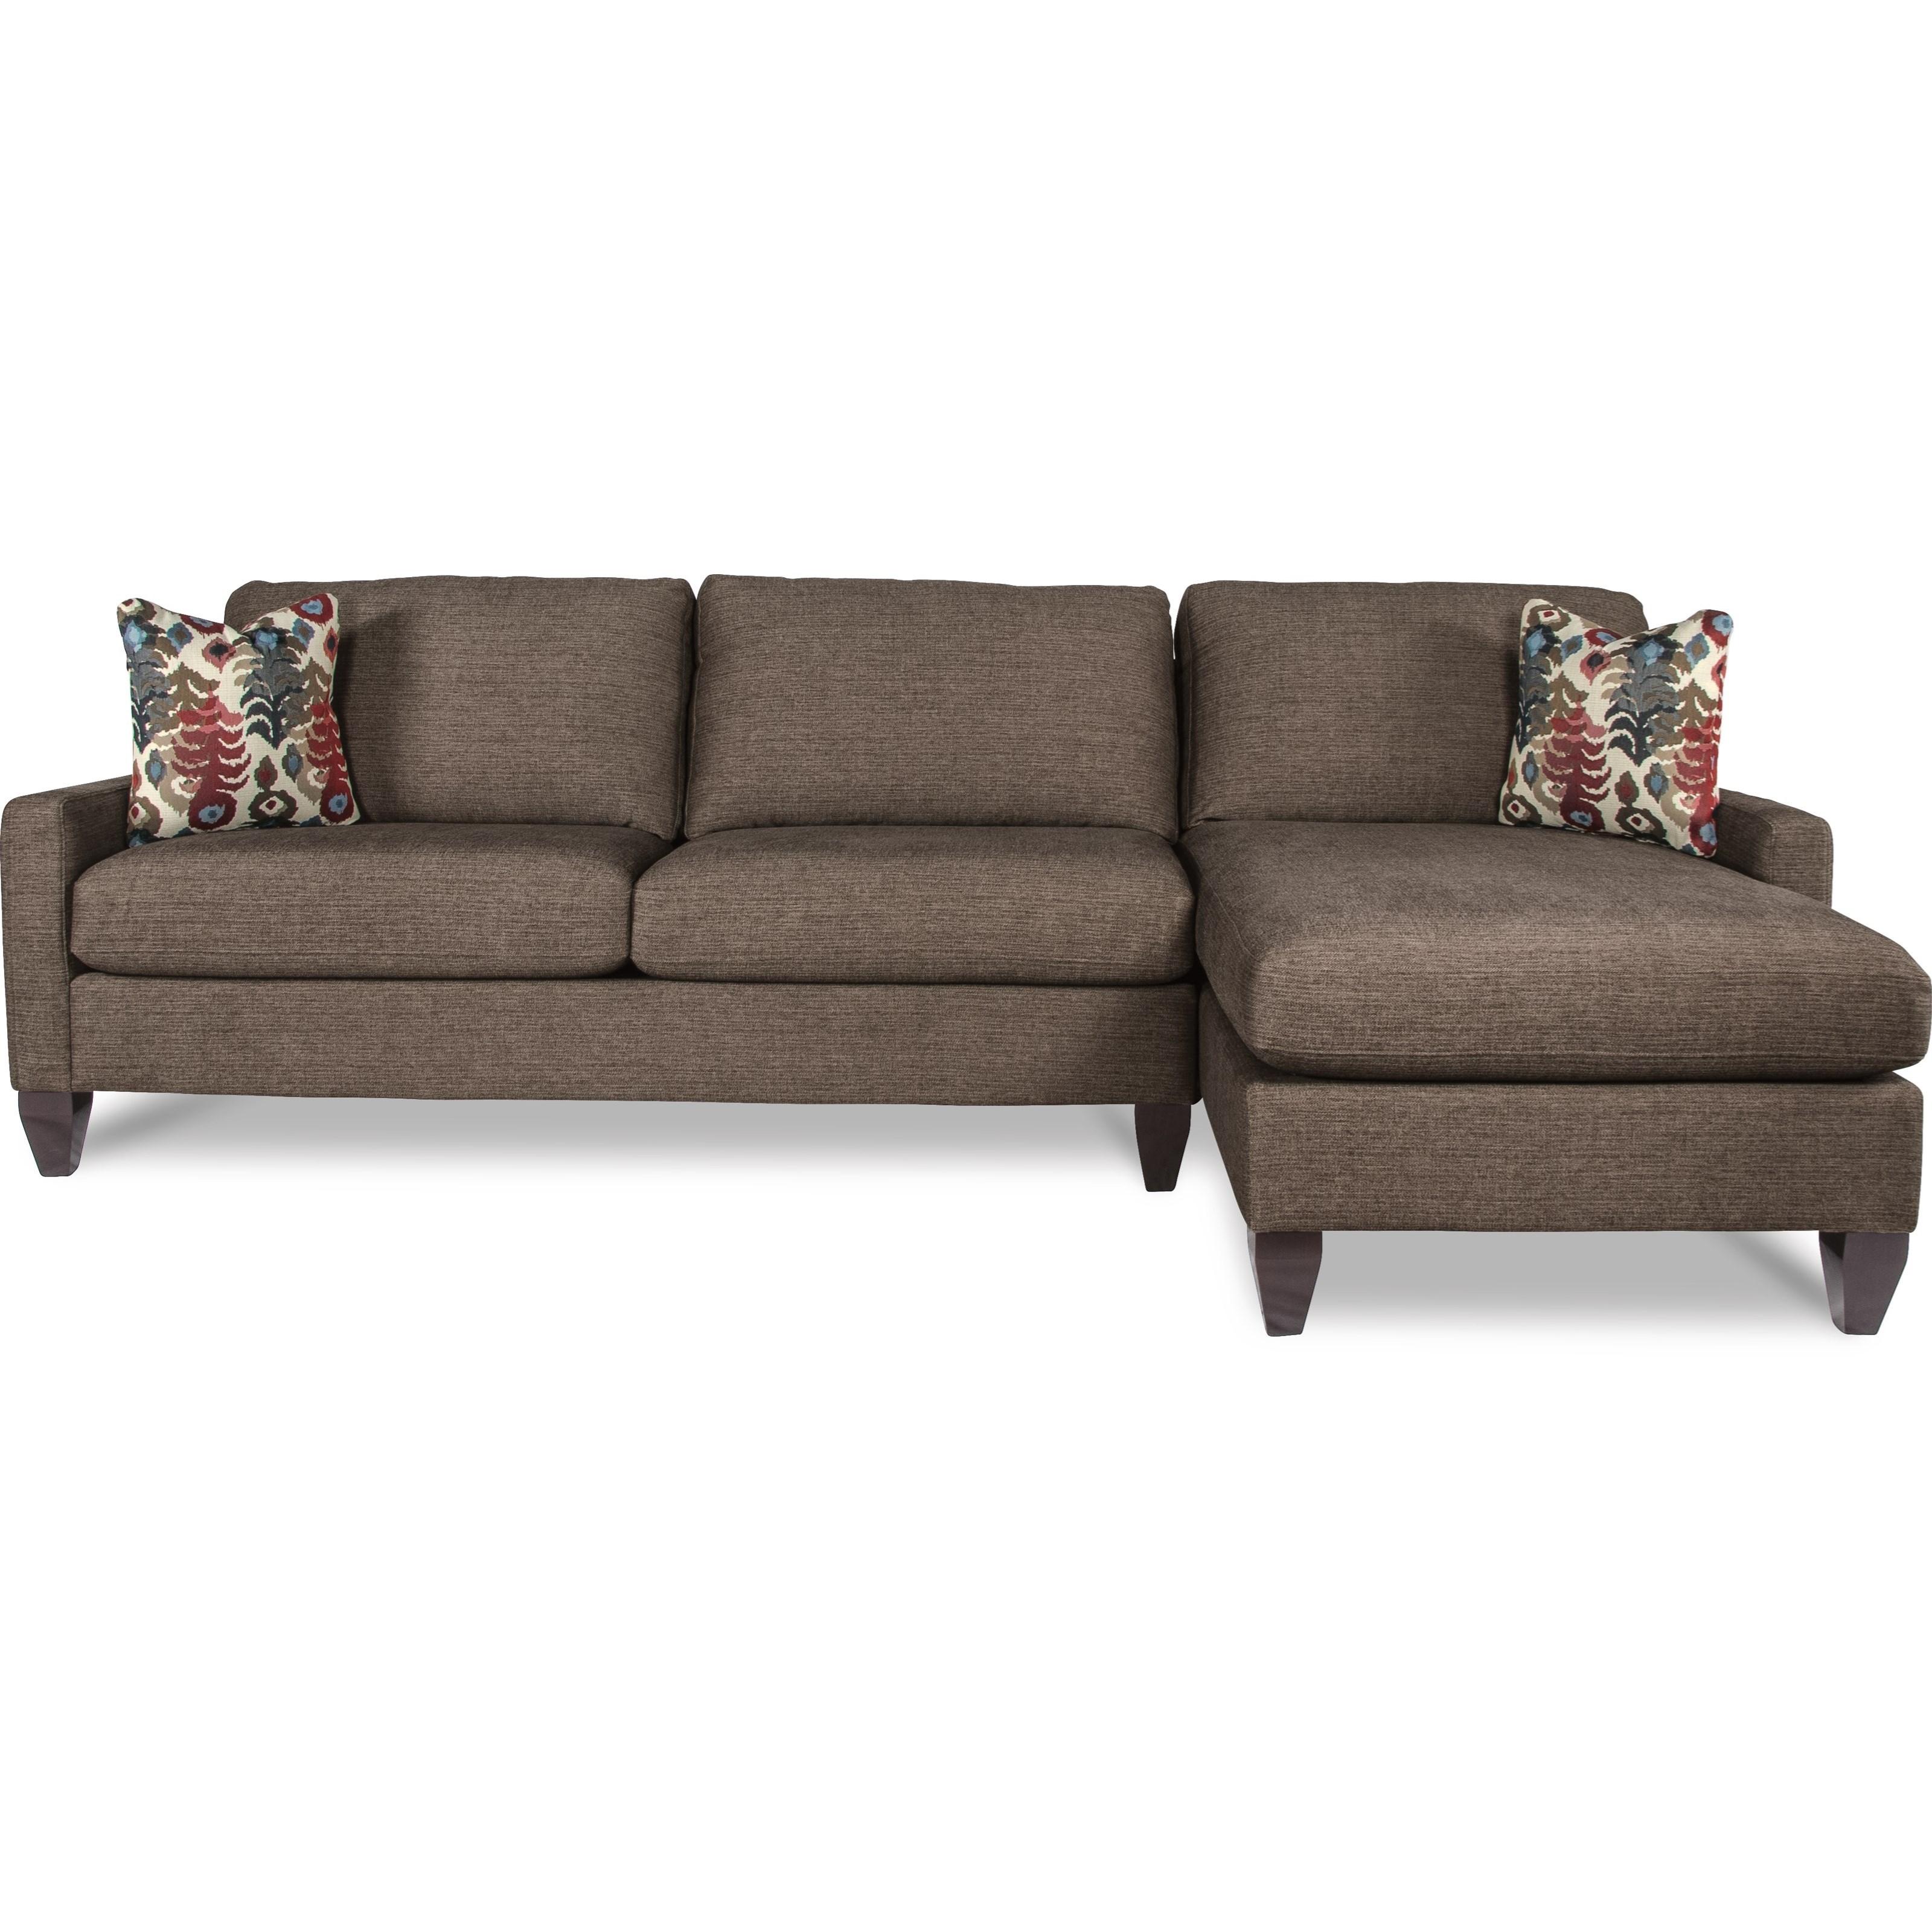 la z boy studio contemporary two piece sectional sofa w. Black Bedroom Furniture Sets. Home Design Ideas